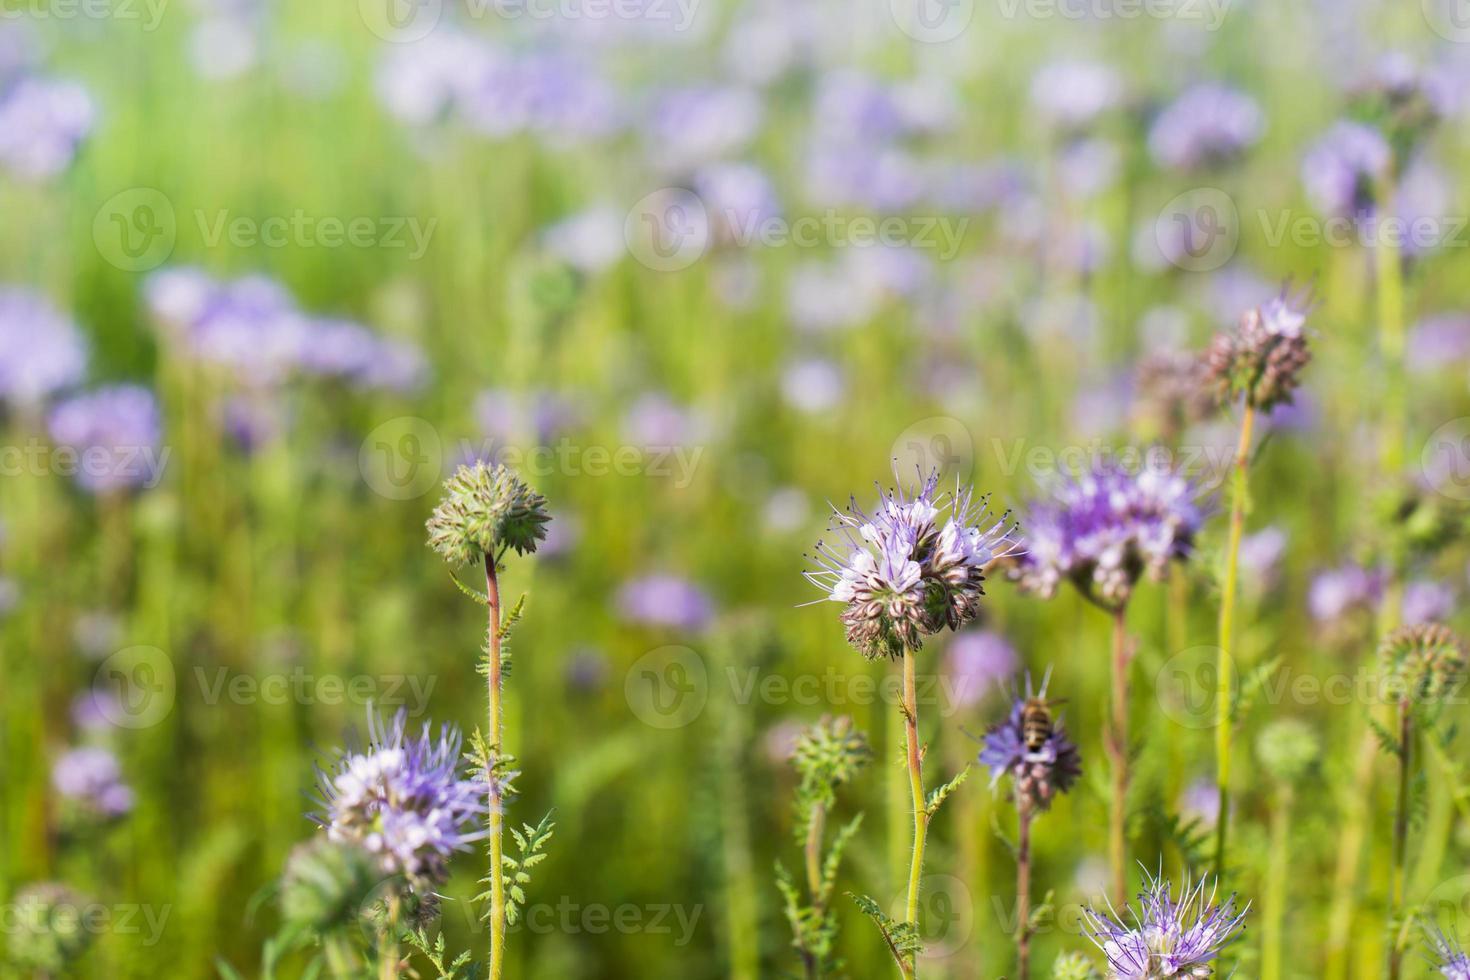 jordbruksfält av phacelia blommor foto